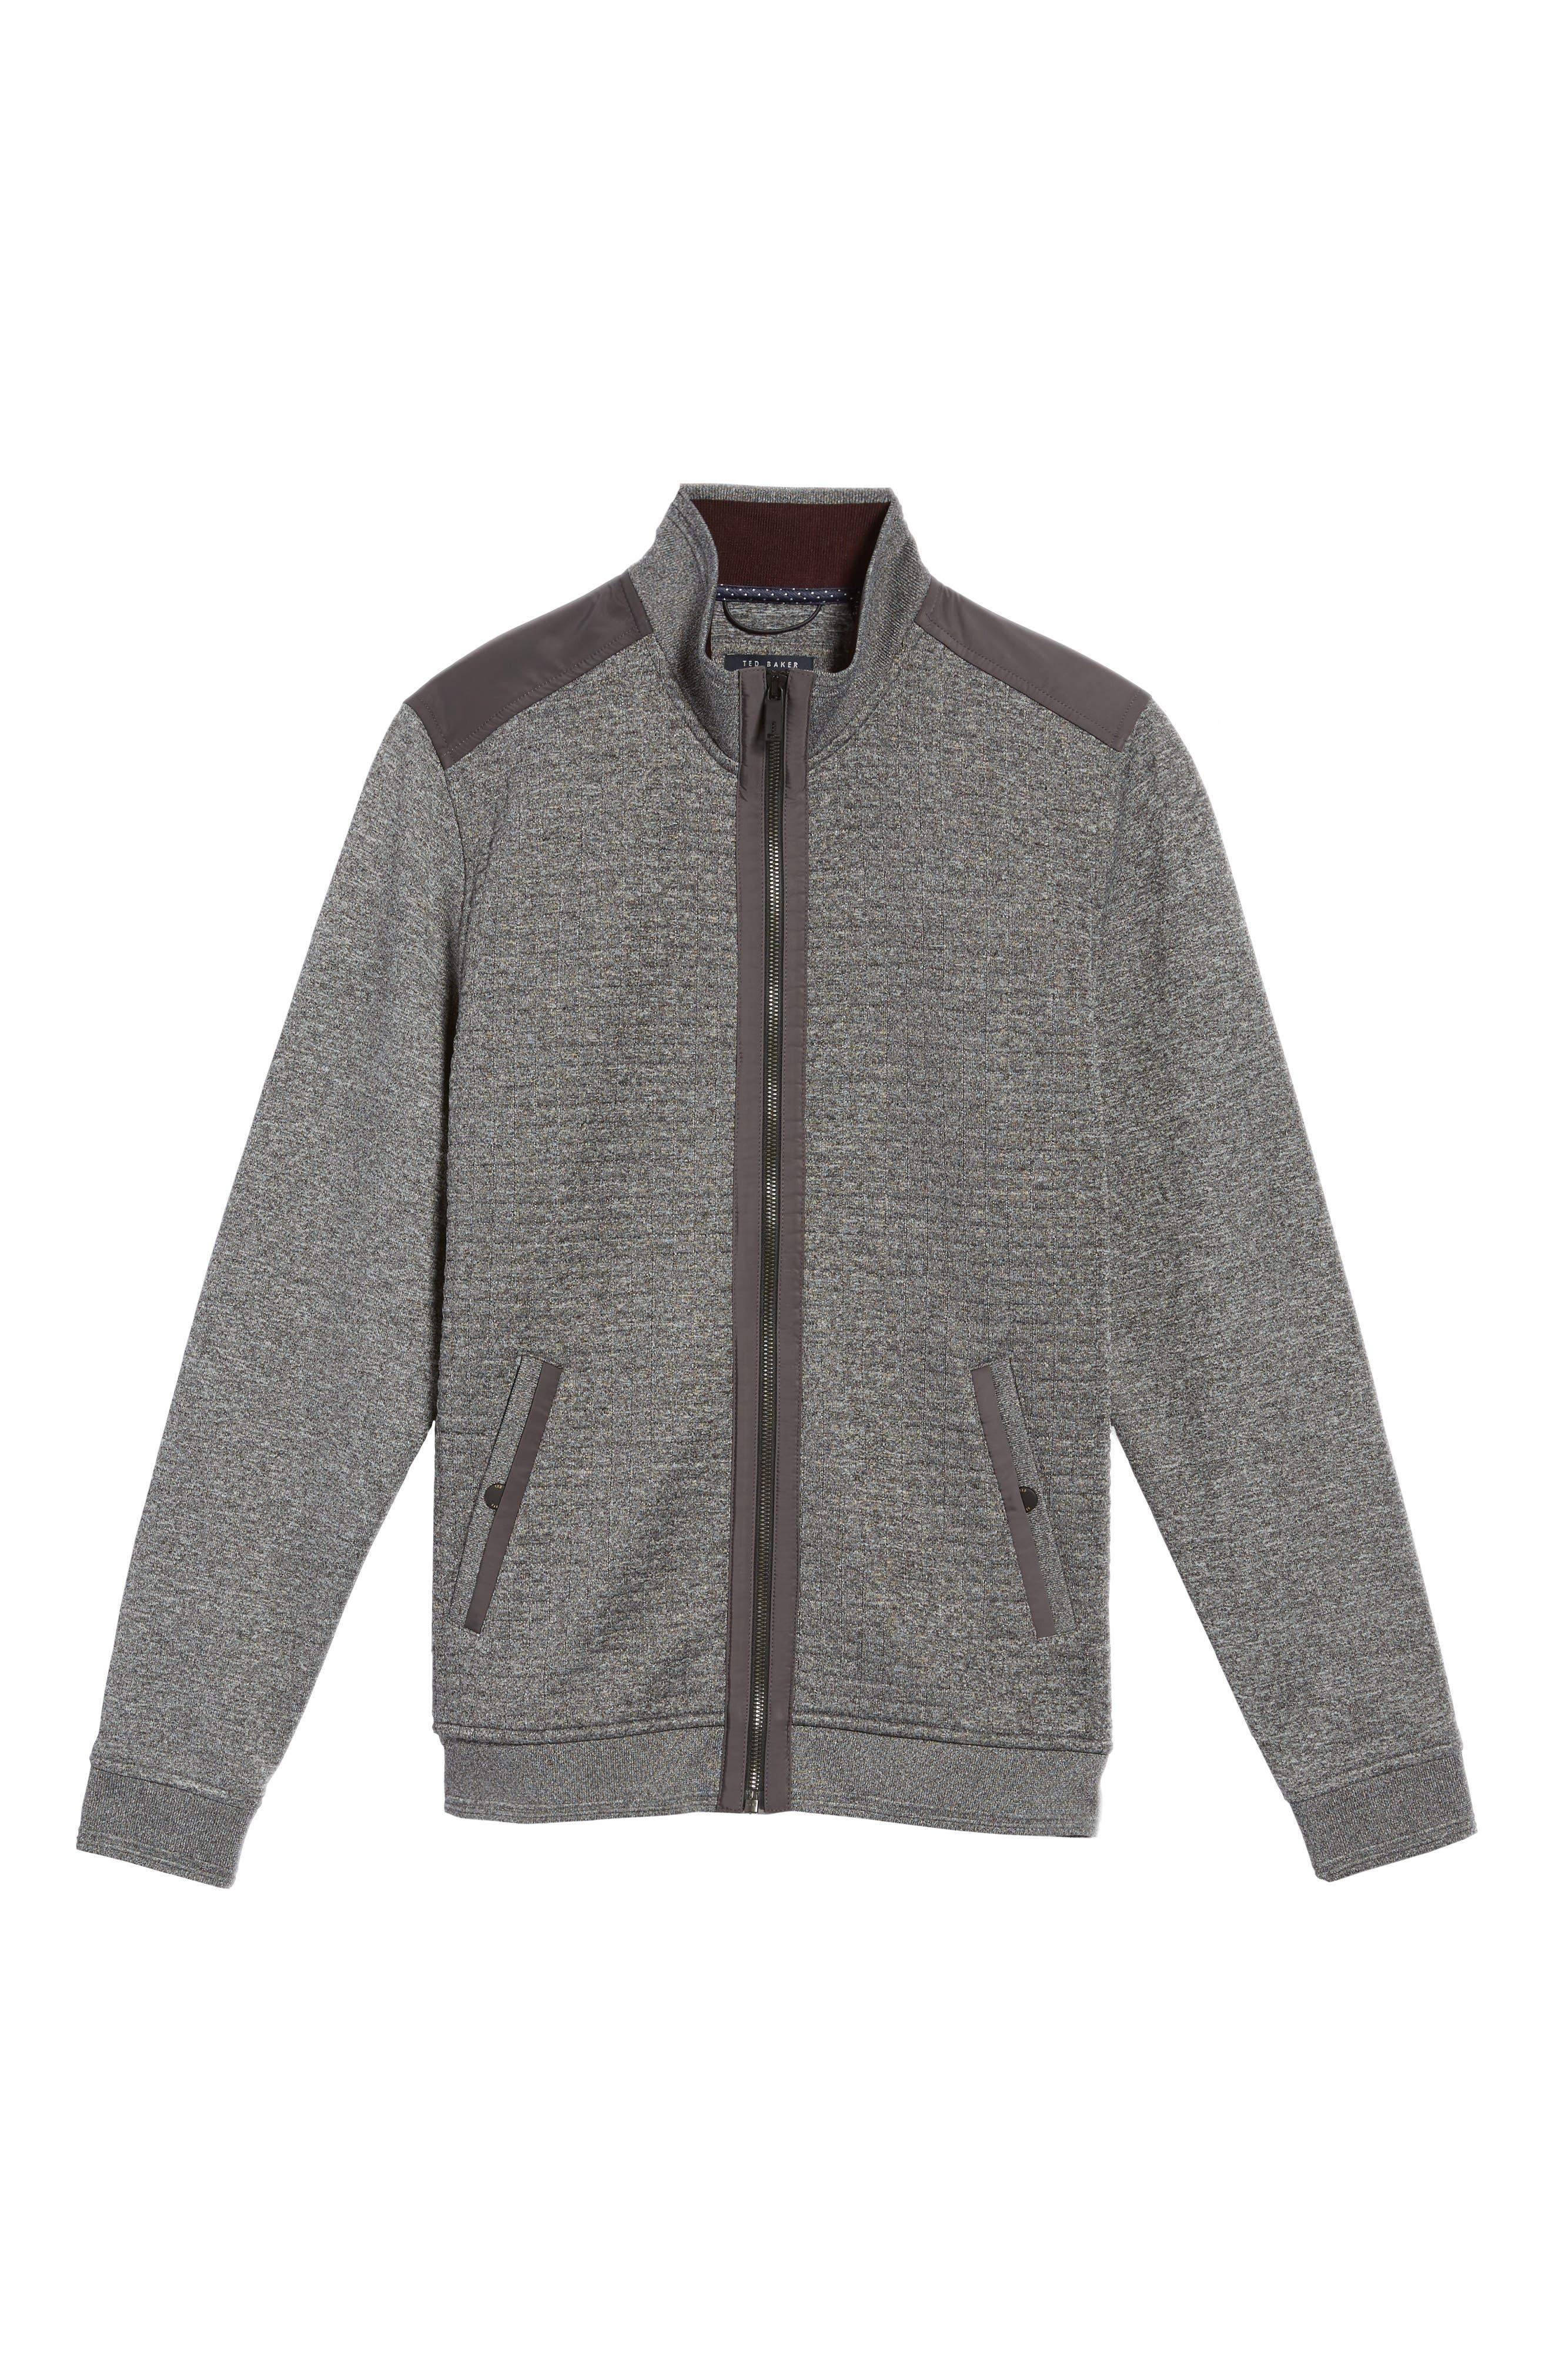 Whooty Full Zip Fleece Jacket,                             Alternate thumbnail 4, color,                             Charcoal